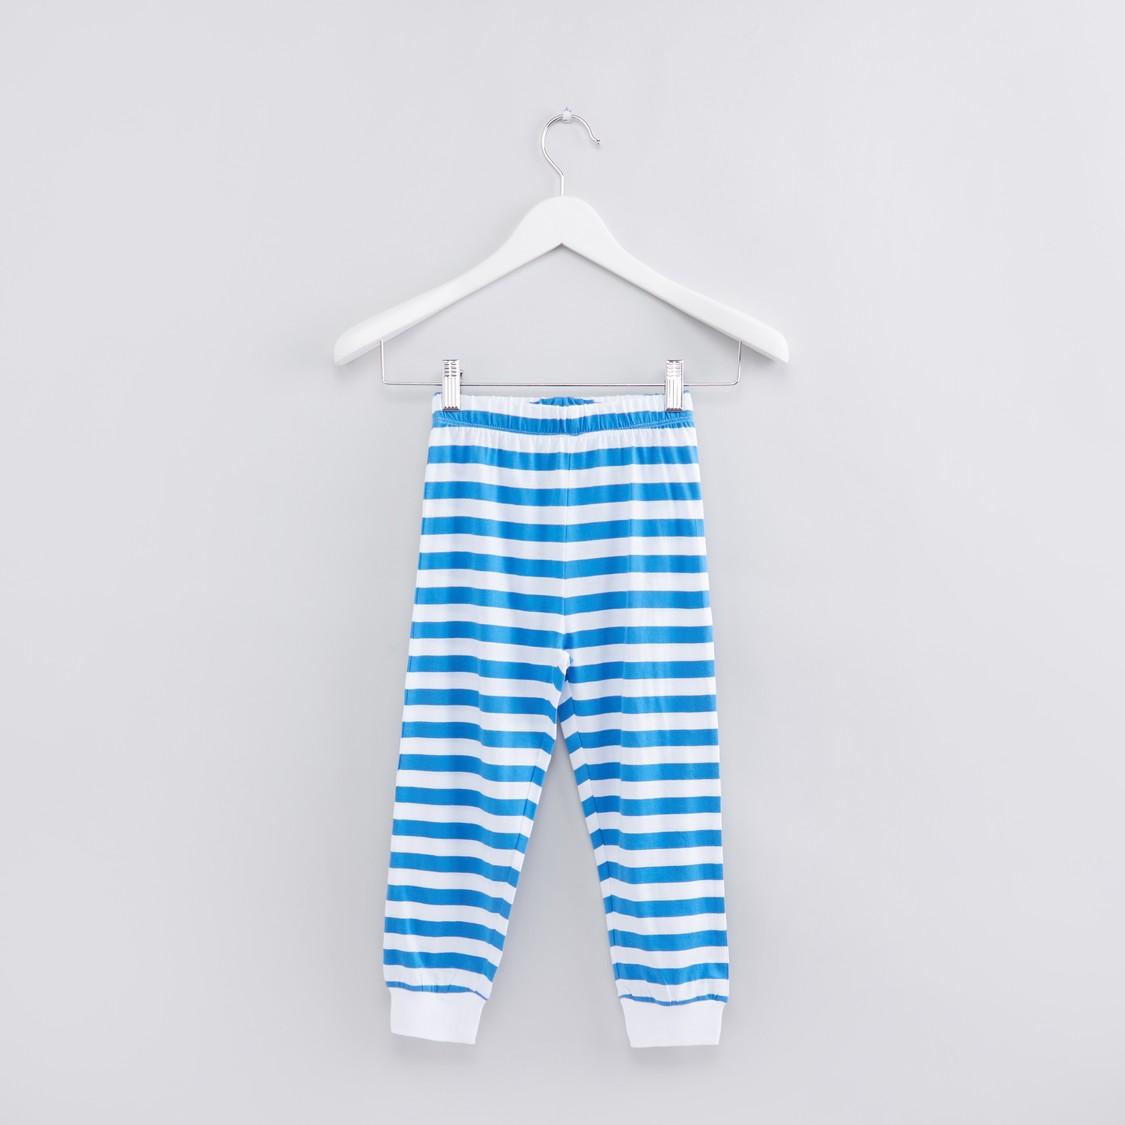 Printed Long Sleeves T-Shirt with Full Length Jog Pants - Set of 2